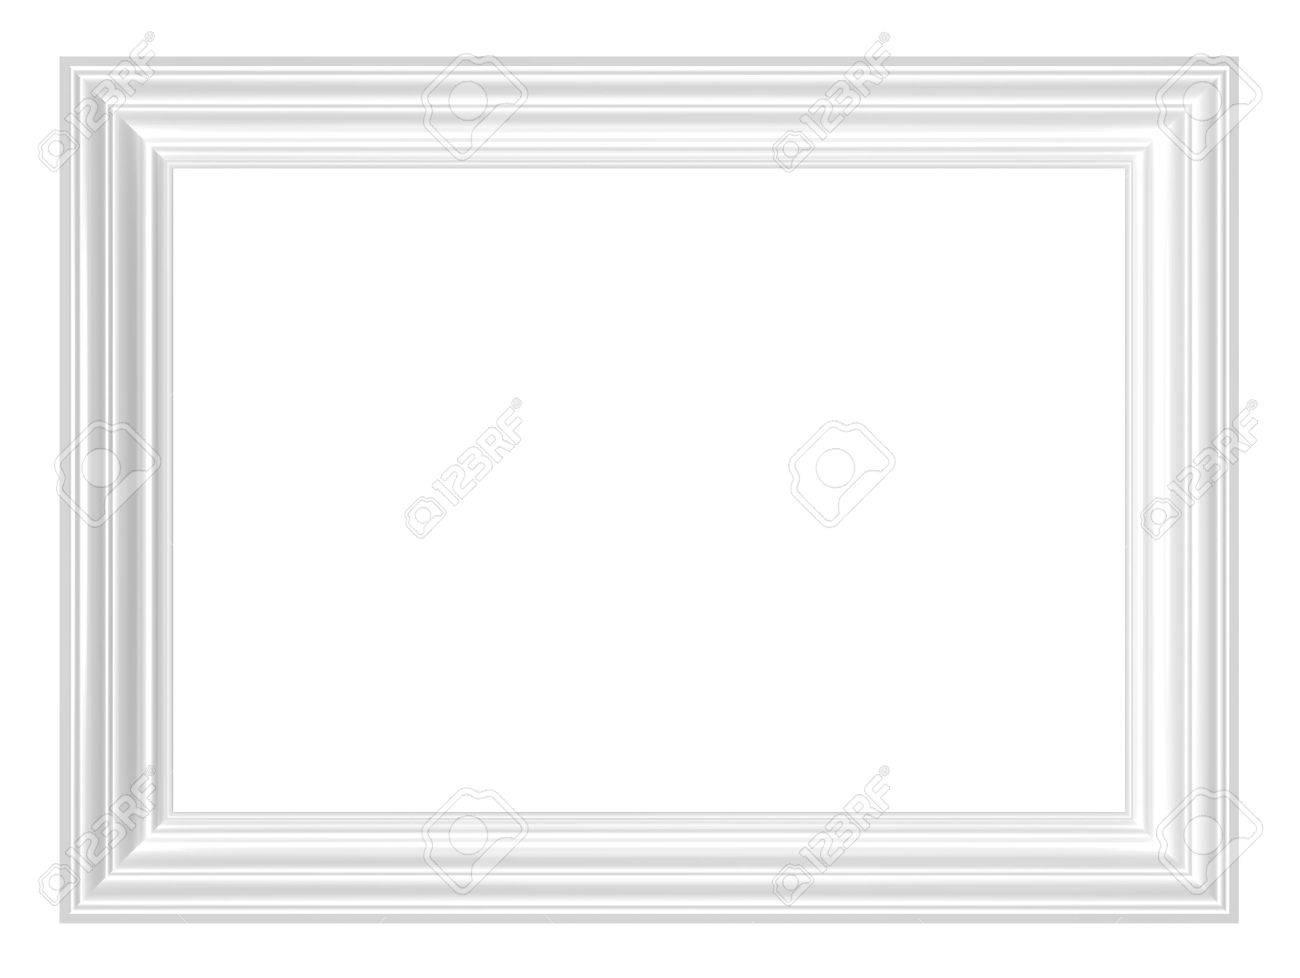 Marco Blanco Aislada Sobre Fondo Blanco. Representación 3D Foto ...